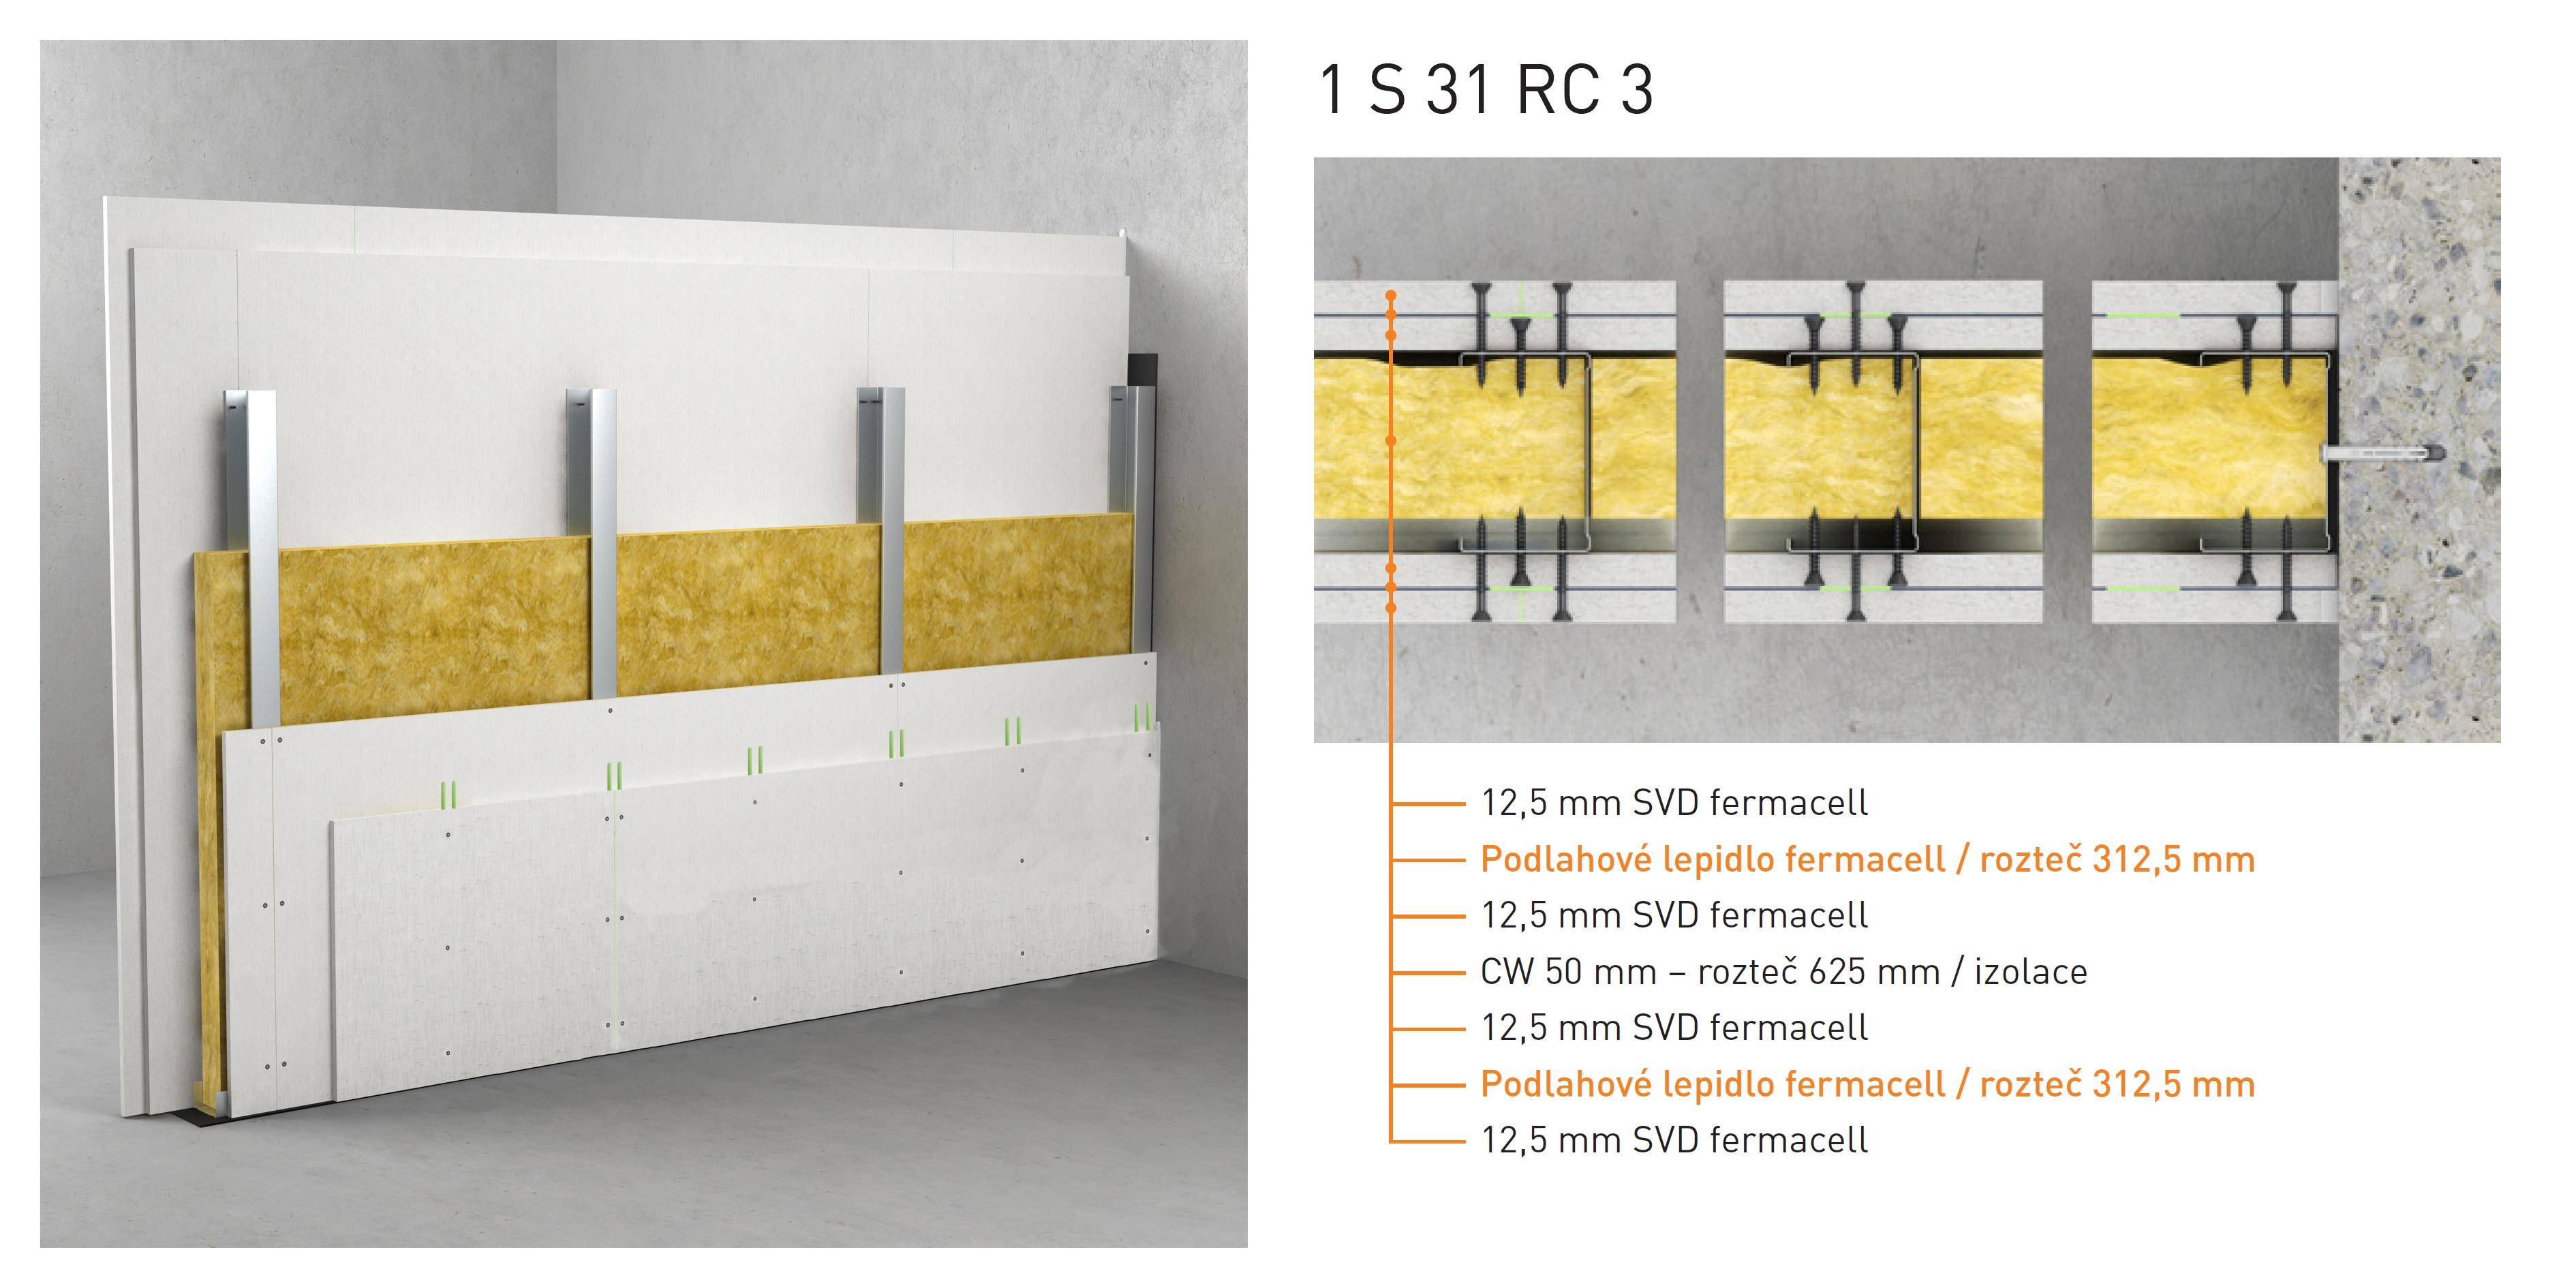 Skladba montované stěny Fermacell 1S31 RC3